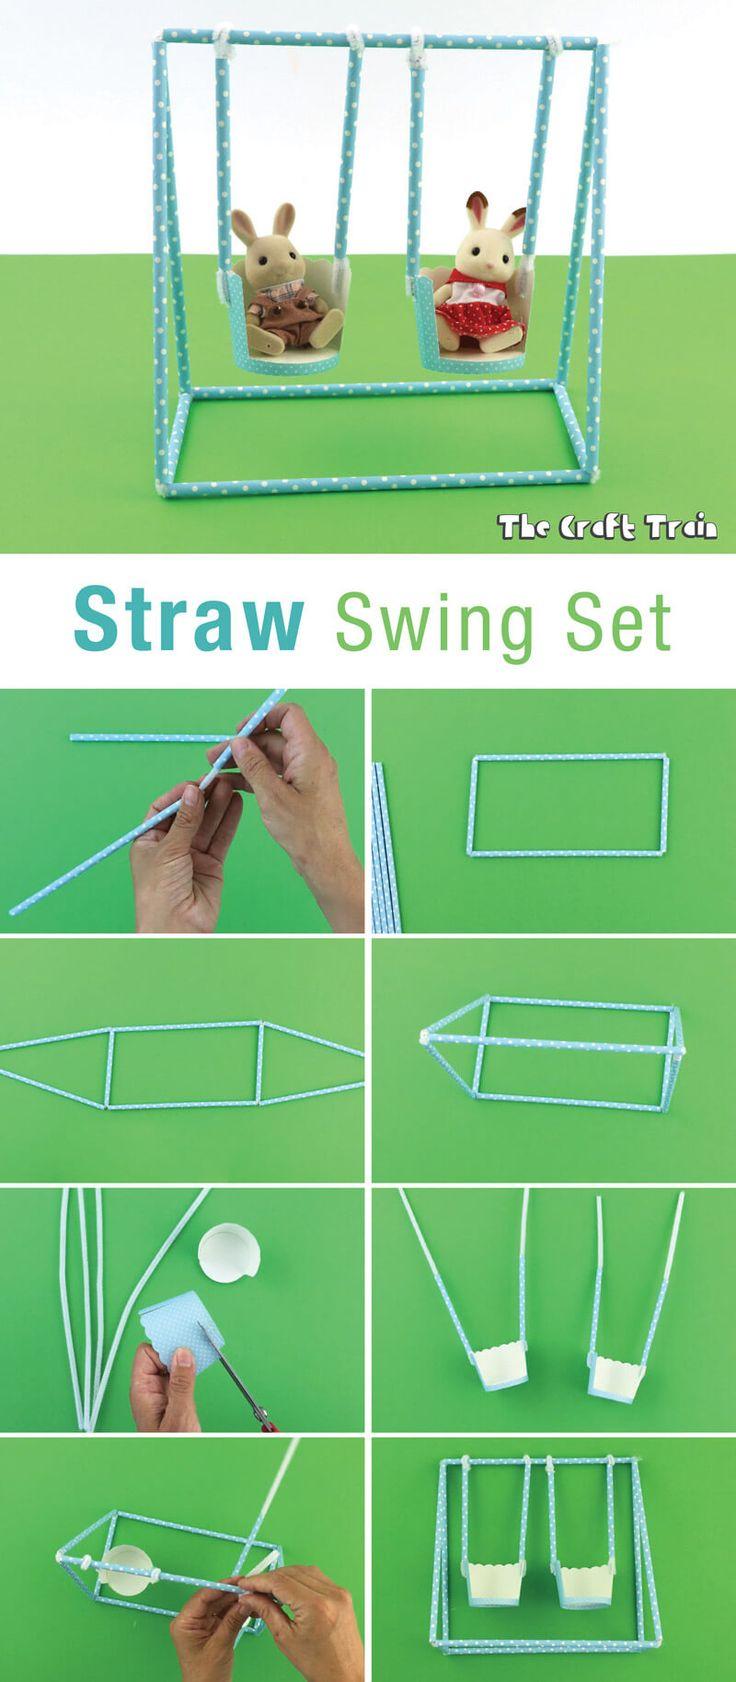 Straw swing set